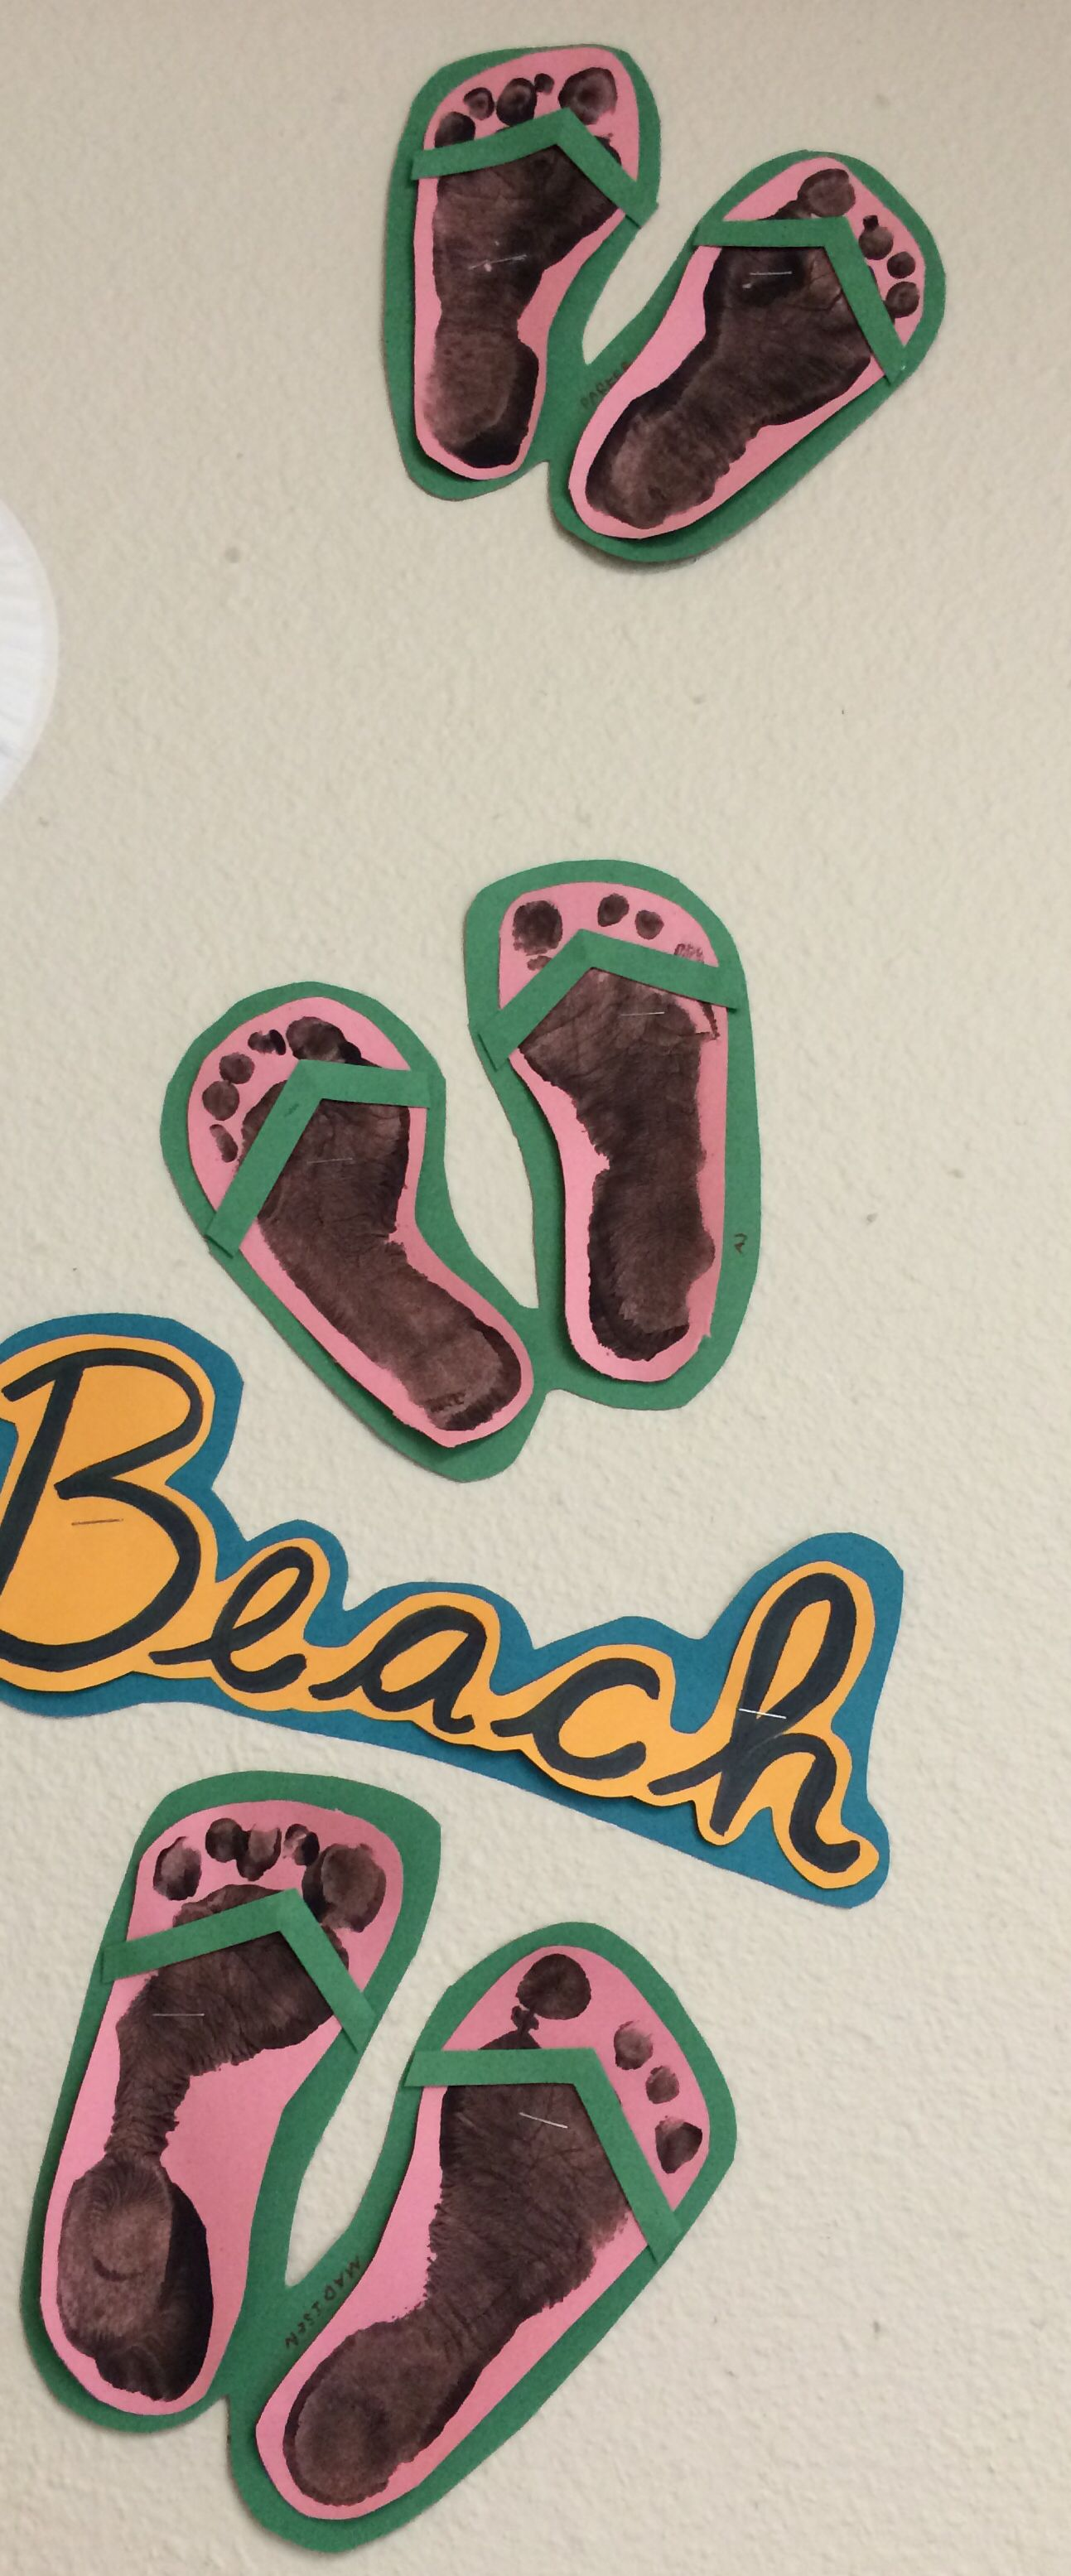 Classroom Design:  Creating a Beach Theme Classroom